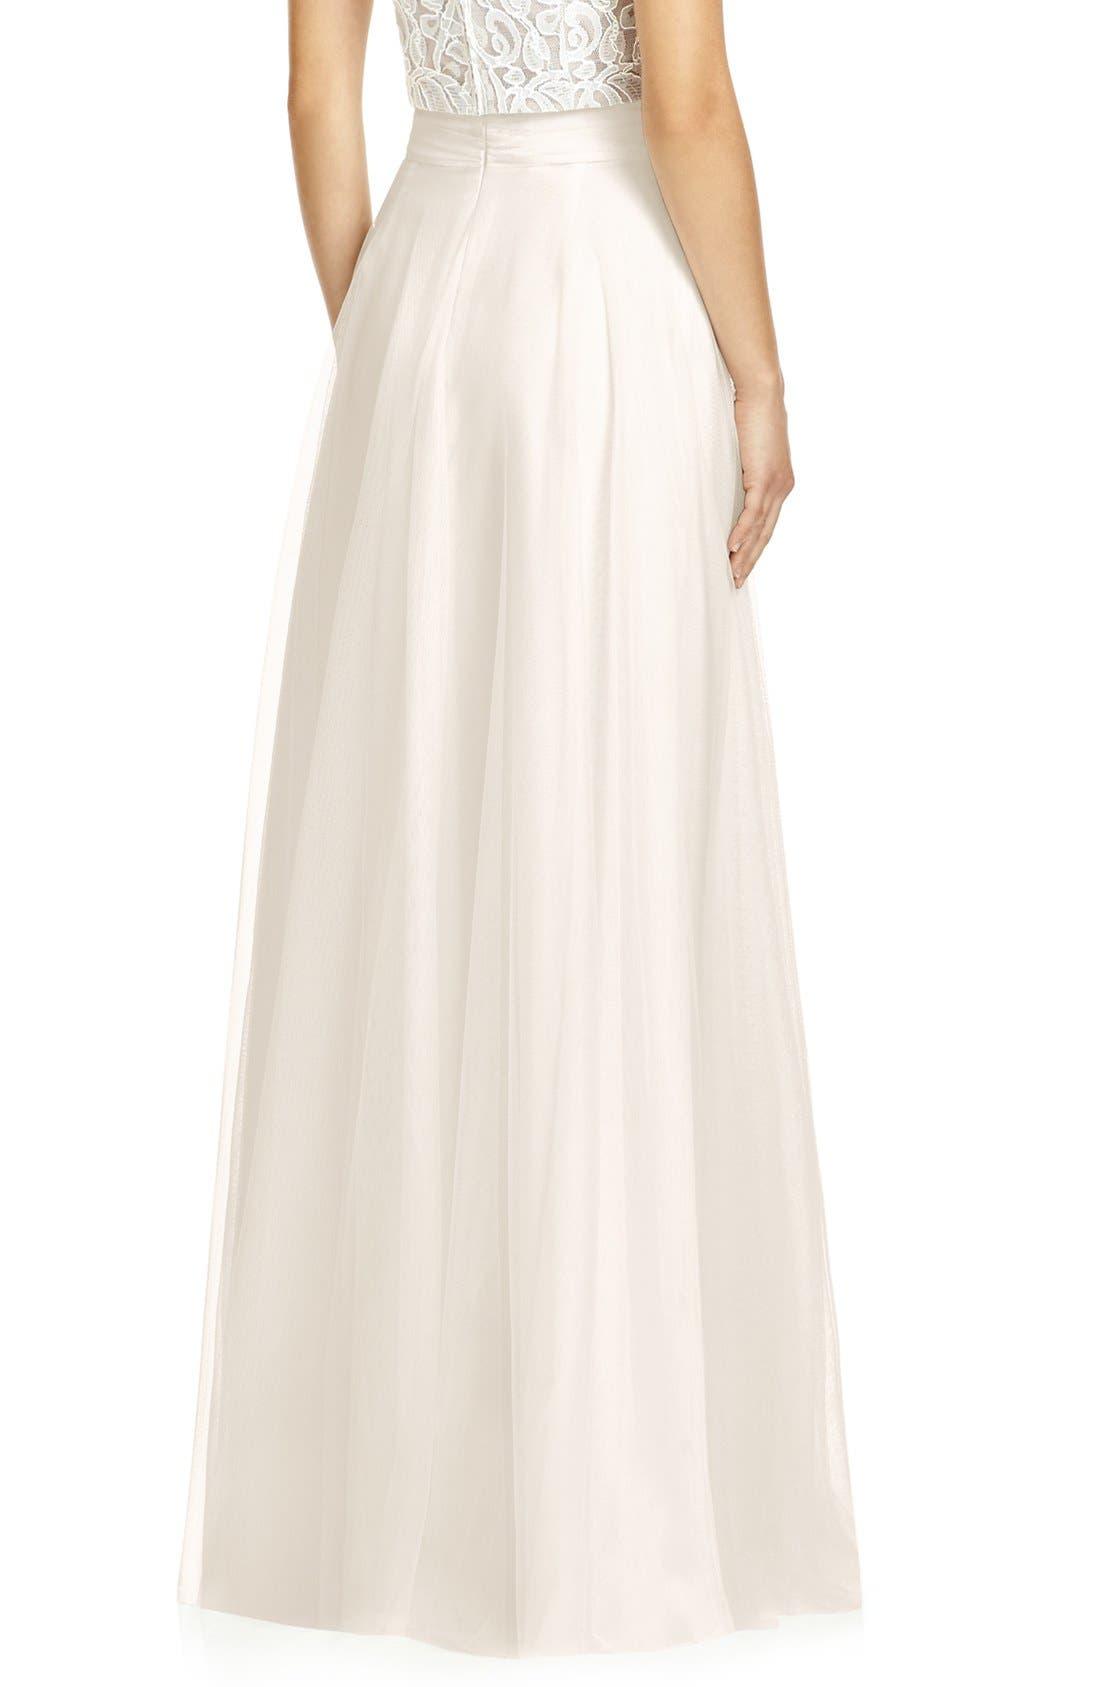 DESSY COLLECTION, Full Length Tulle Skirt, Alternate thumbnail 2, color, IVORY